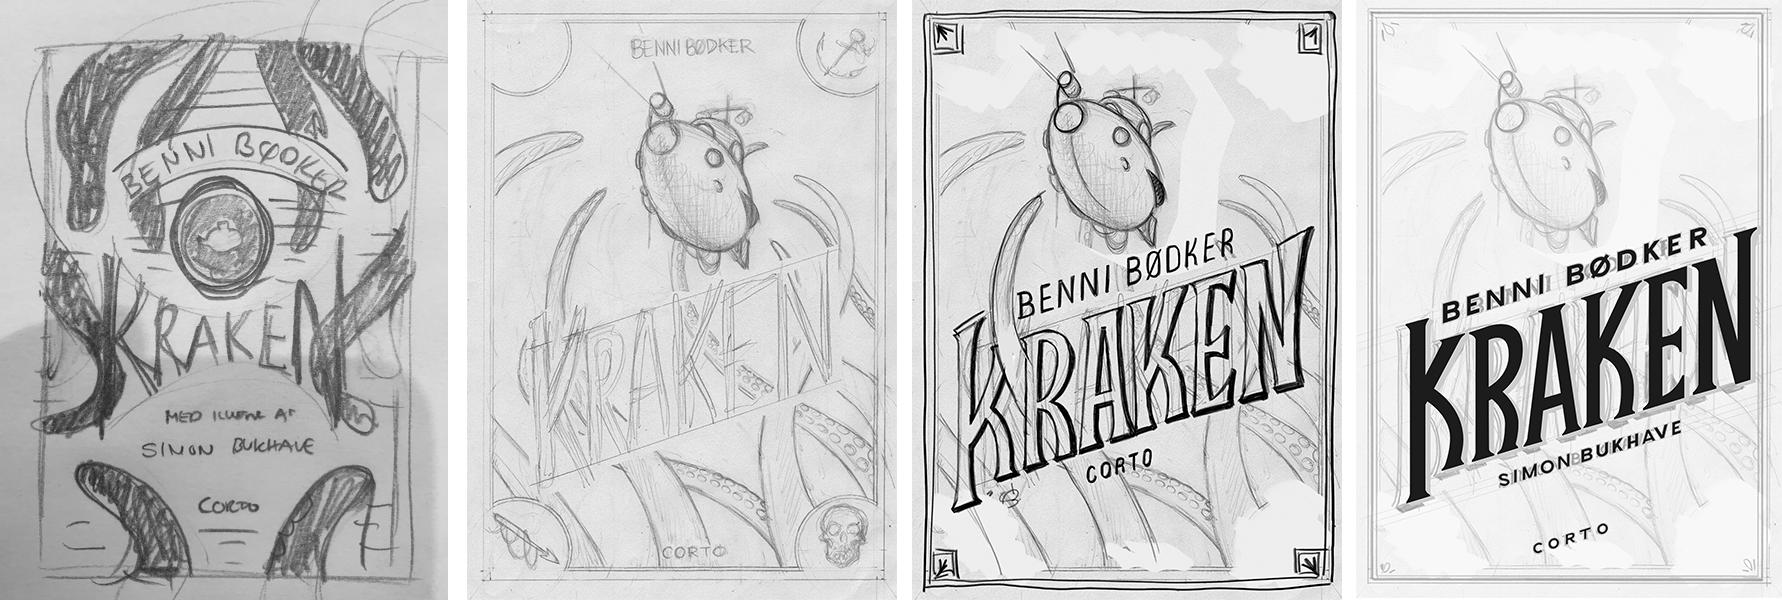 bogomslag-bogdesign-bookcover-kraken-malene-hald-12